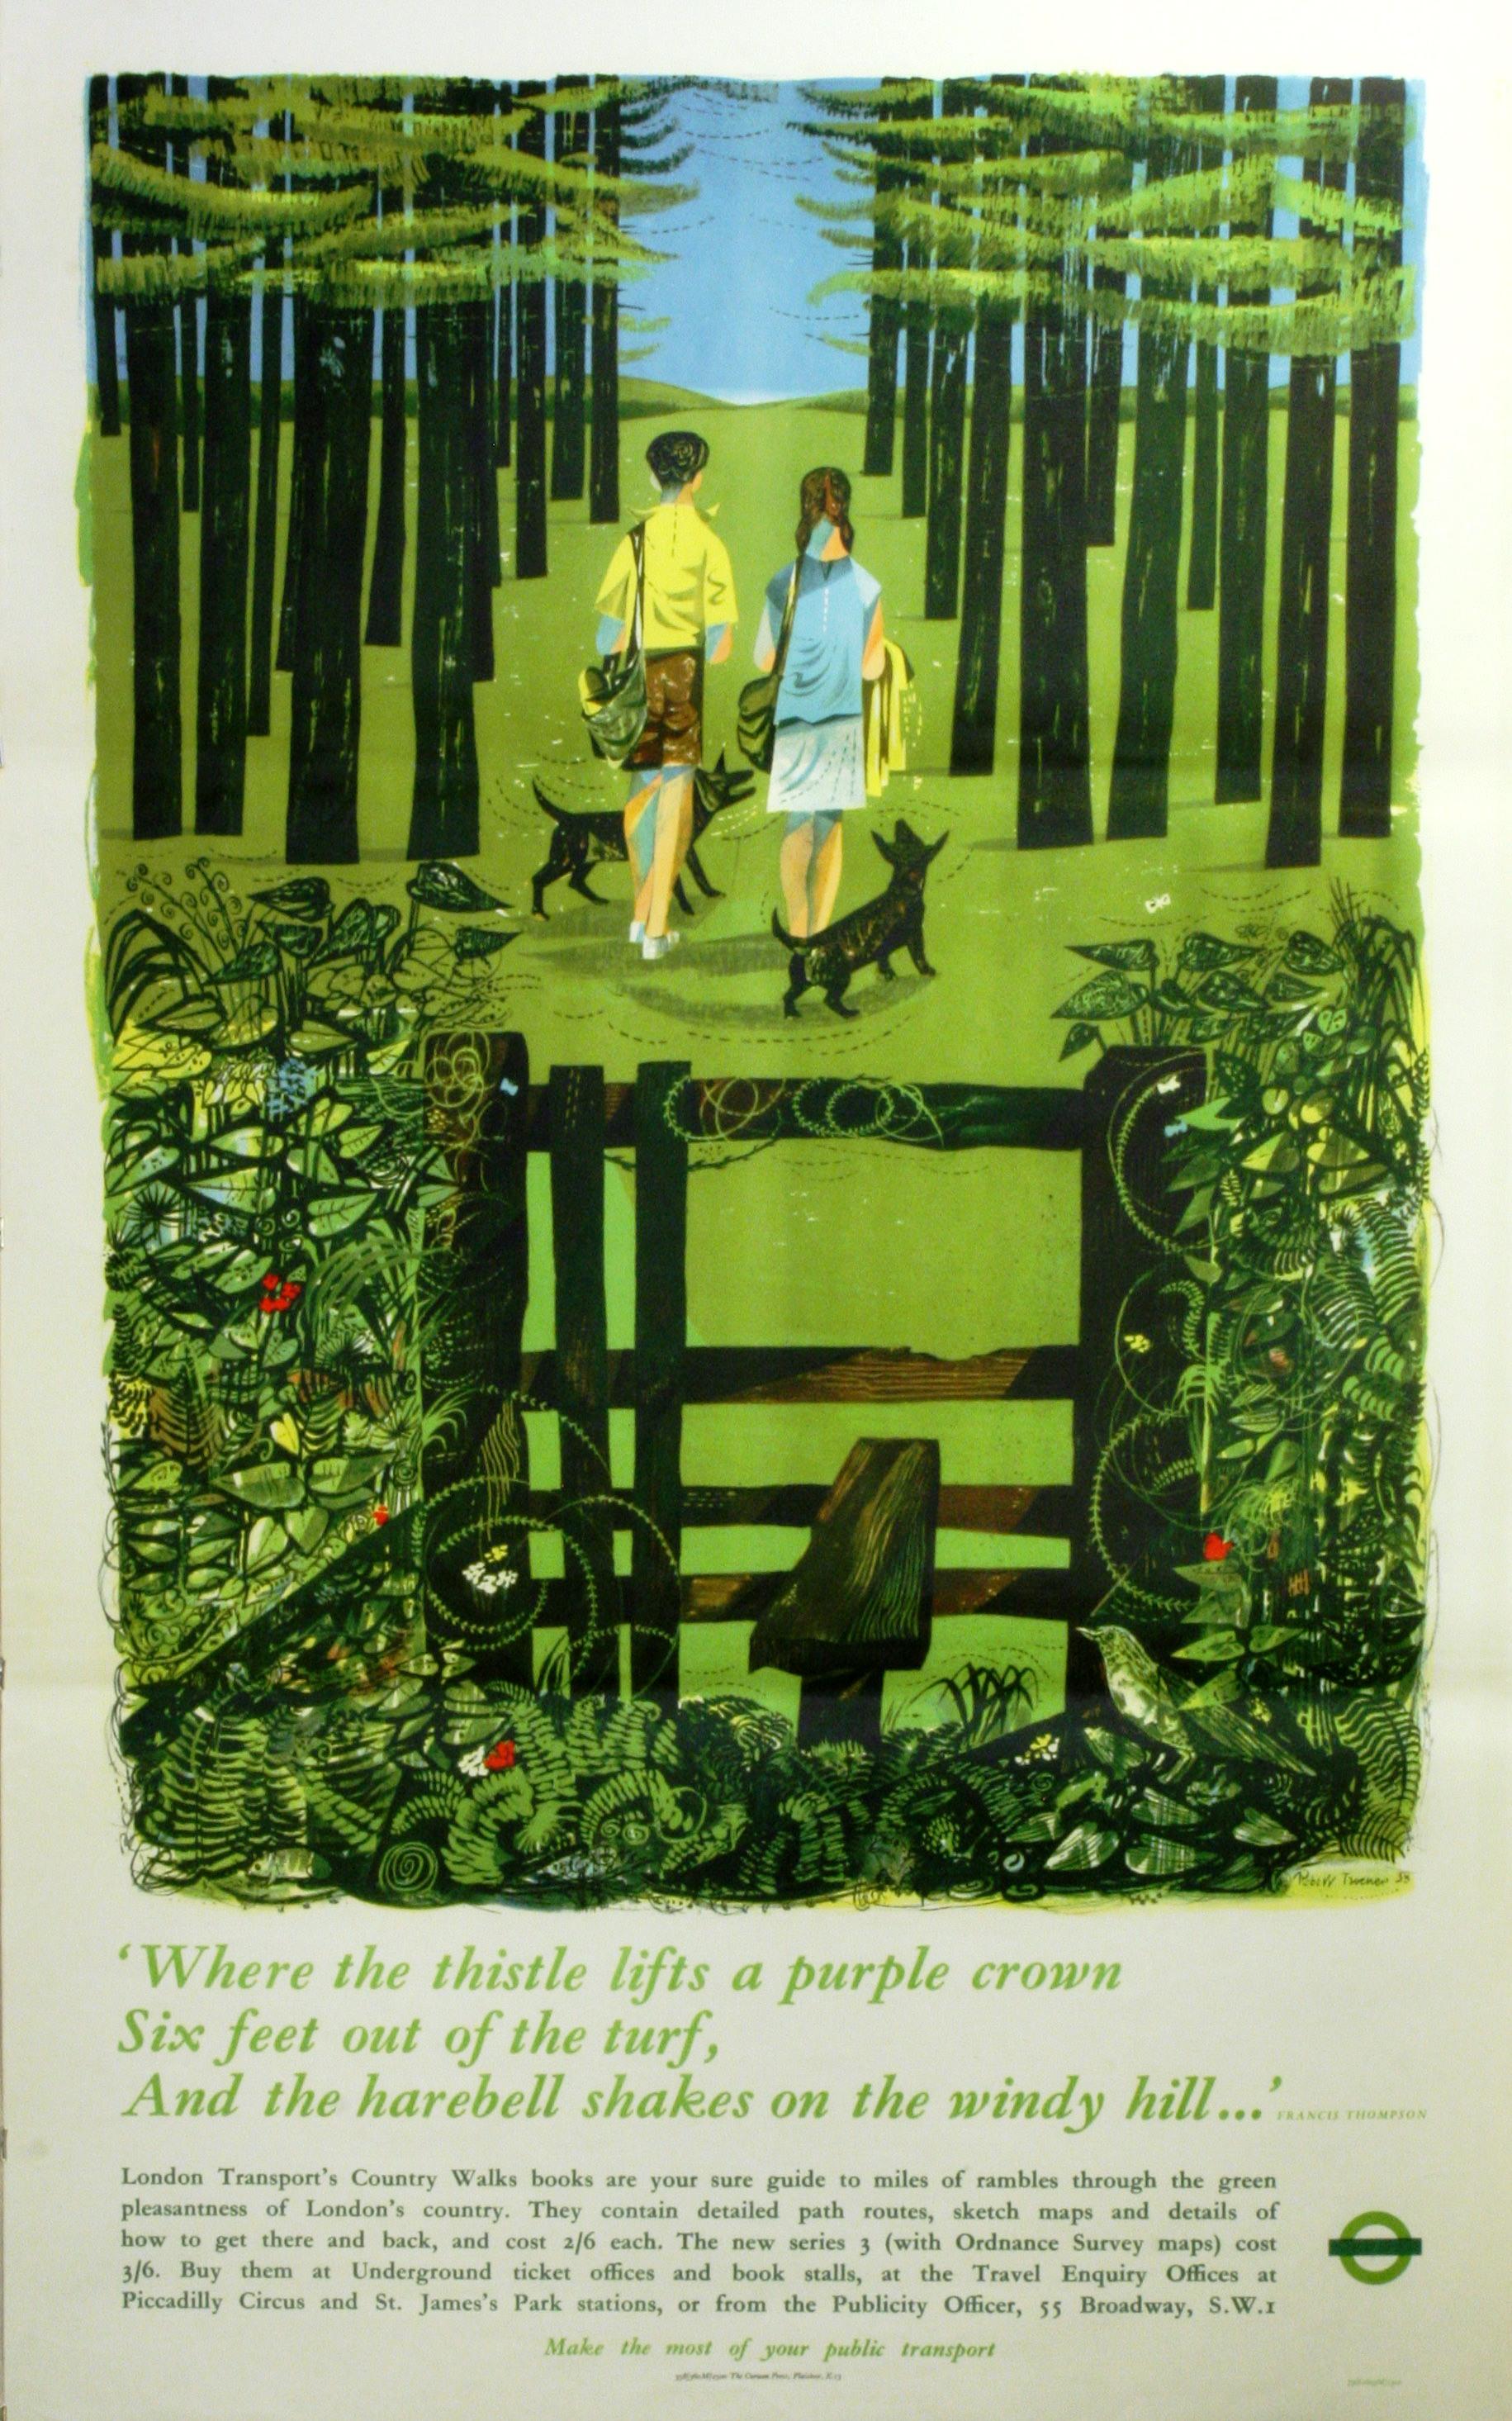 Lot 1512 - Advertising Poster London Transport Country Walks Turner